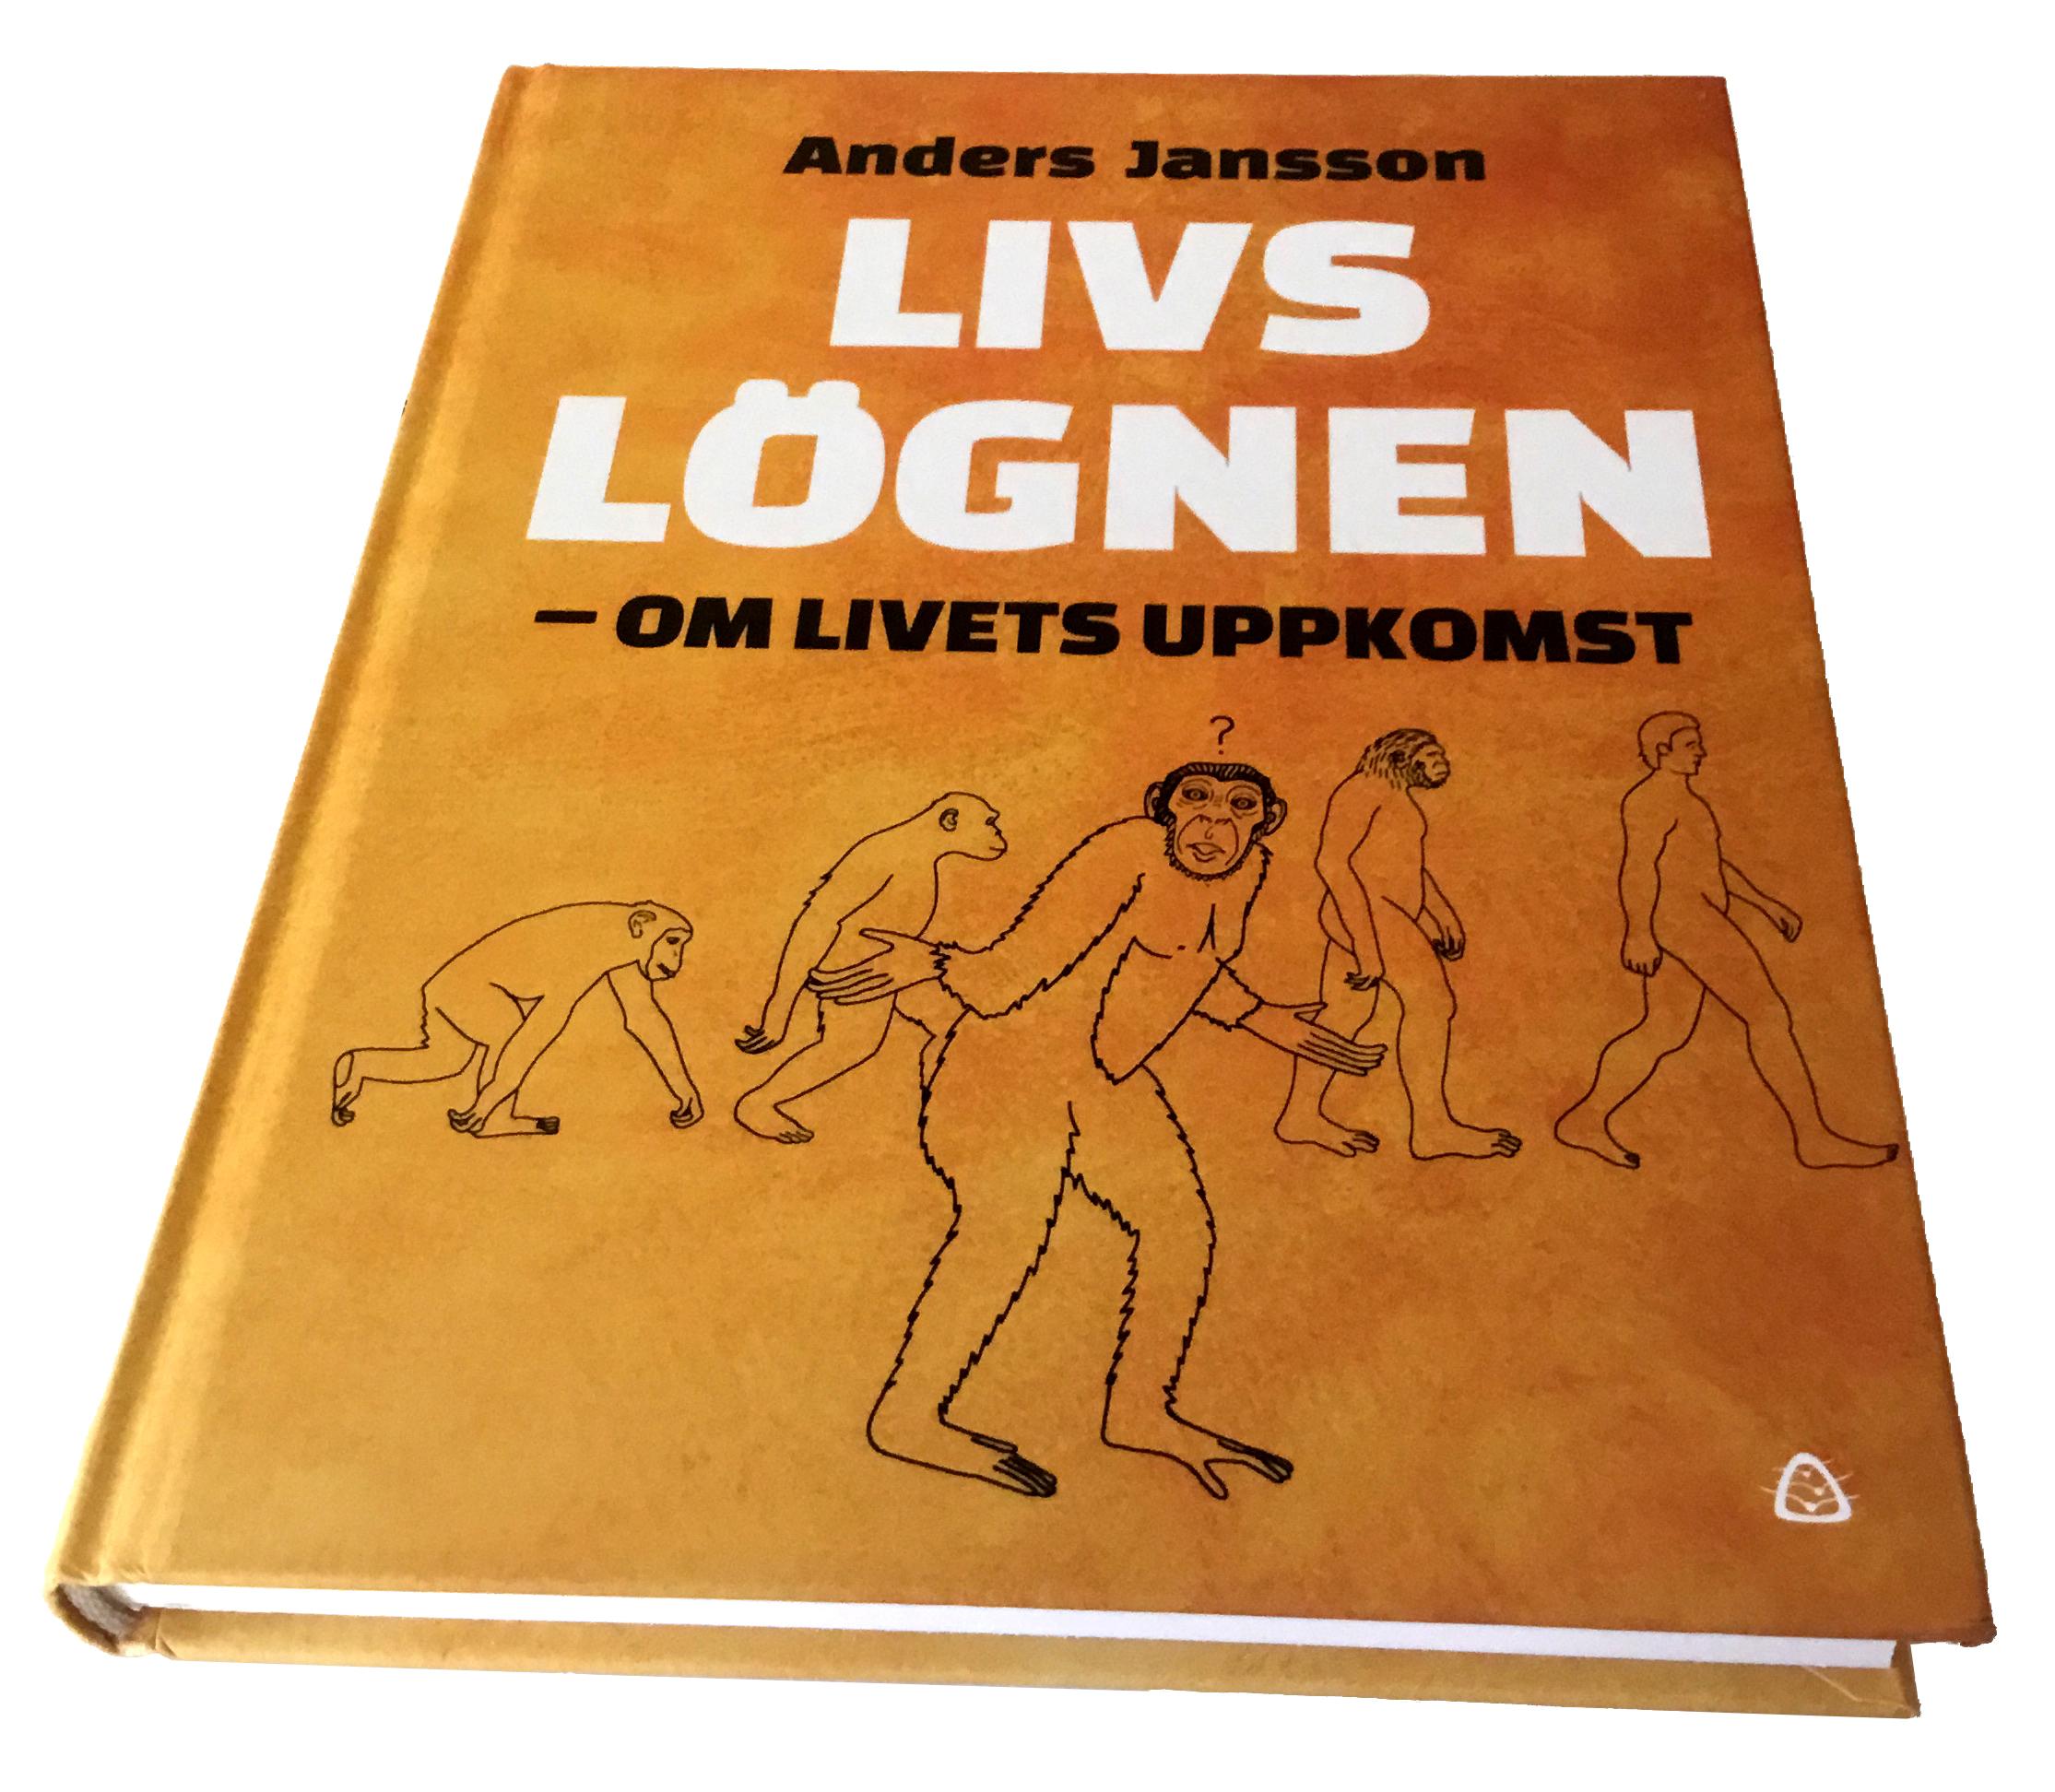 Livslögnen / Anders Jansson